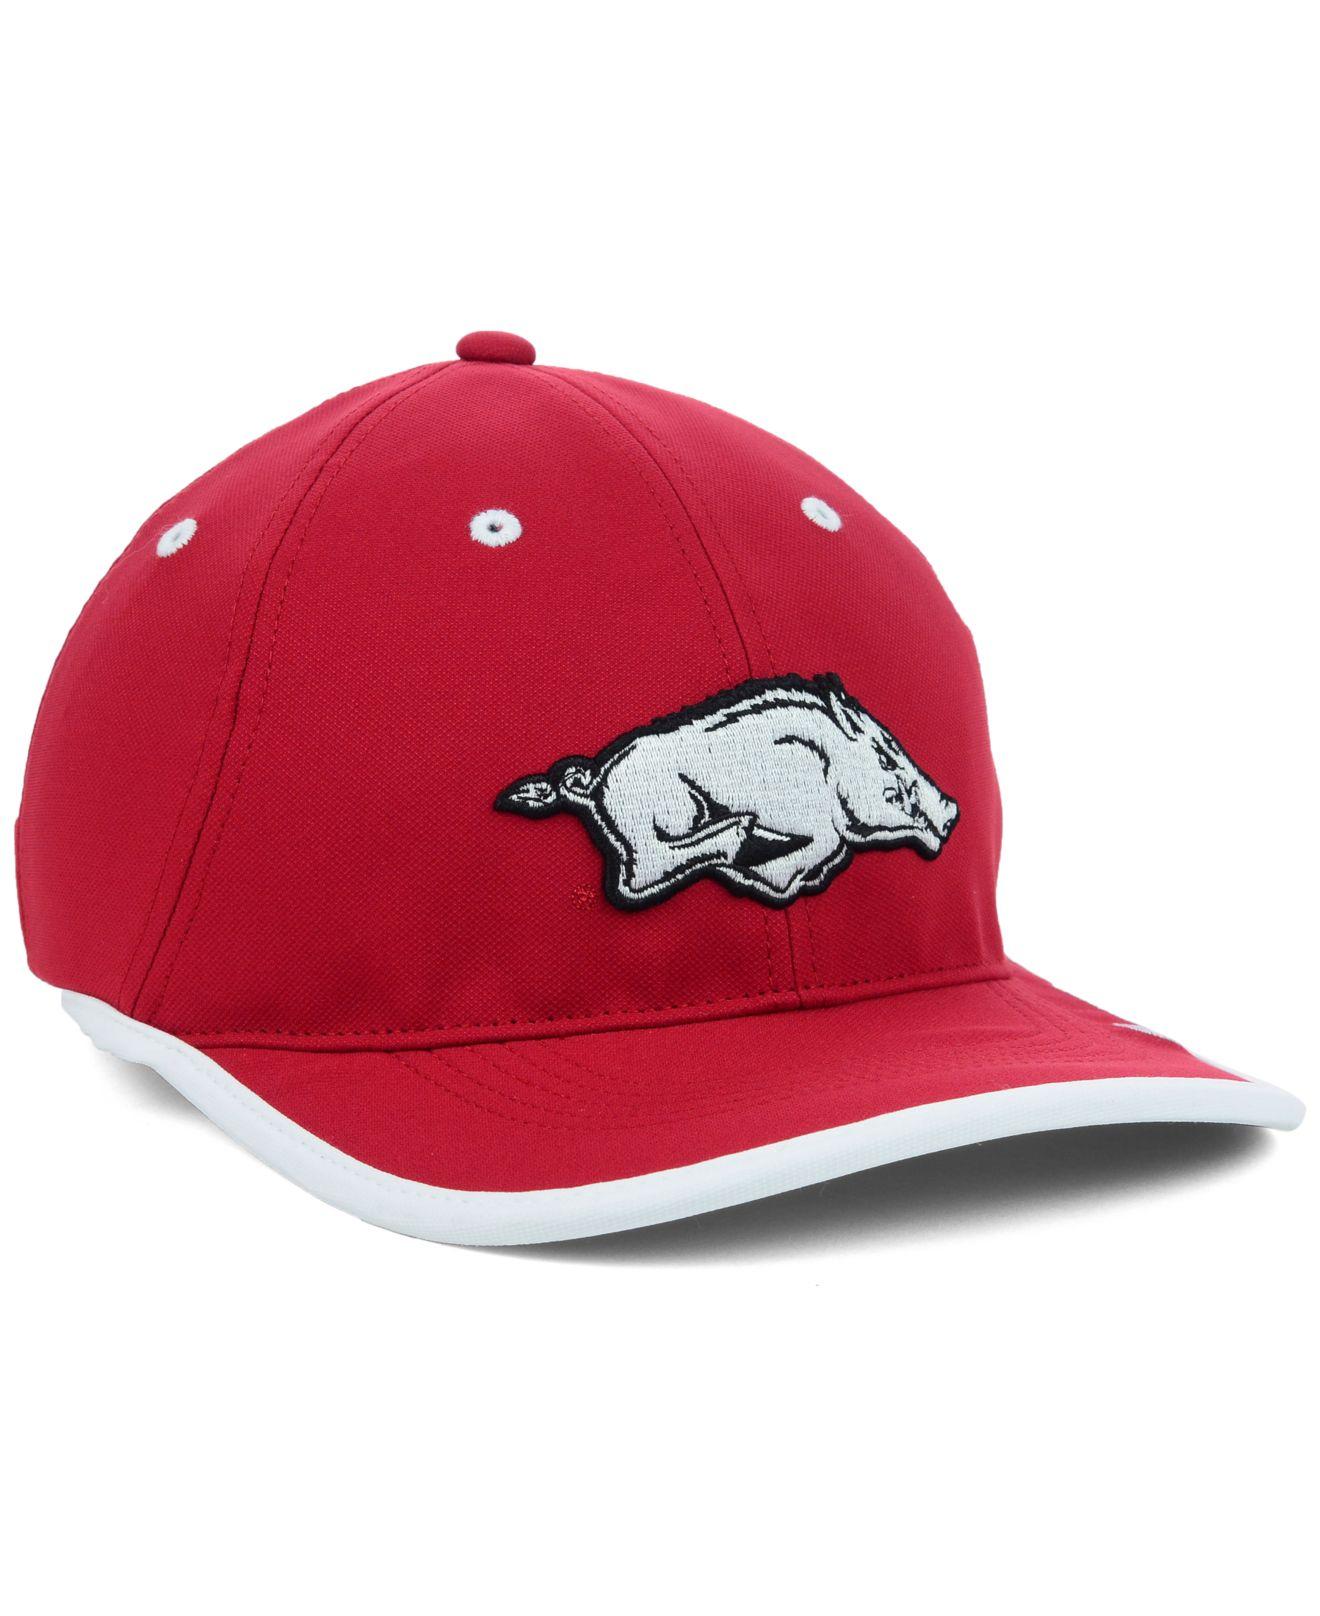 c5e2d0bb Nike Arkansas Razorbacks Coaches Dri-fit Cap in Red for Men - Lyst